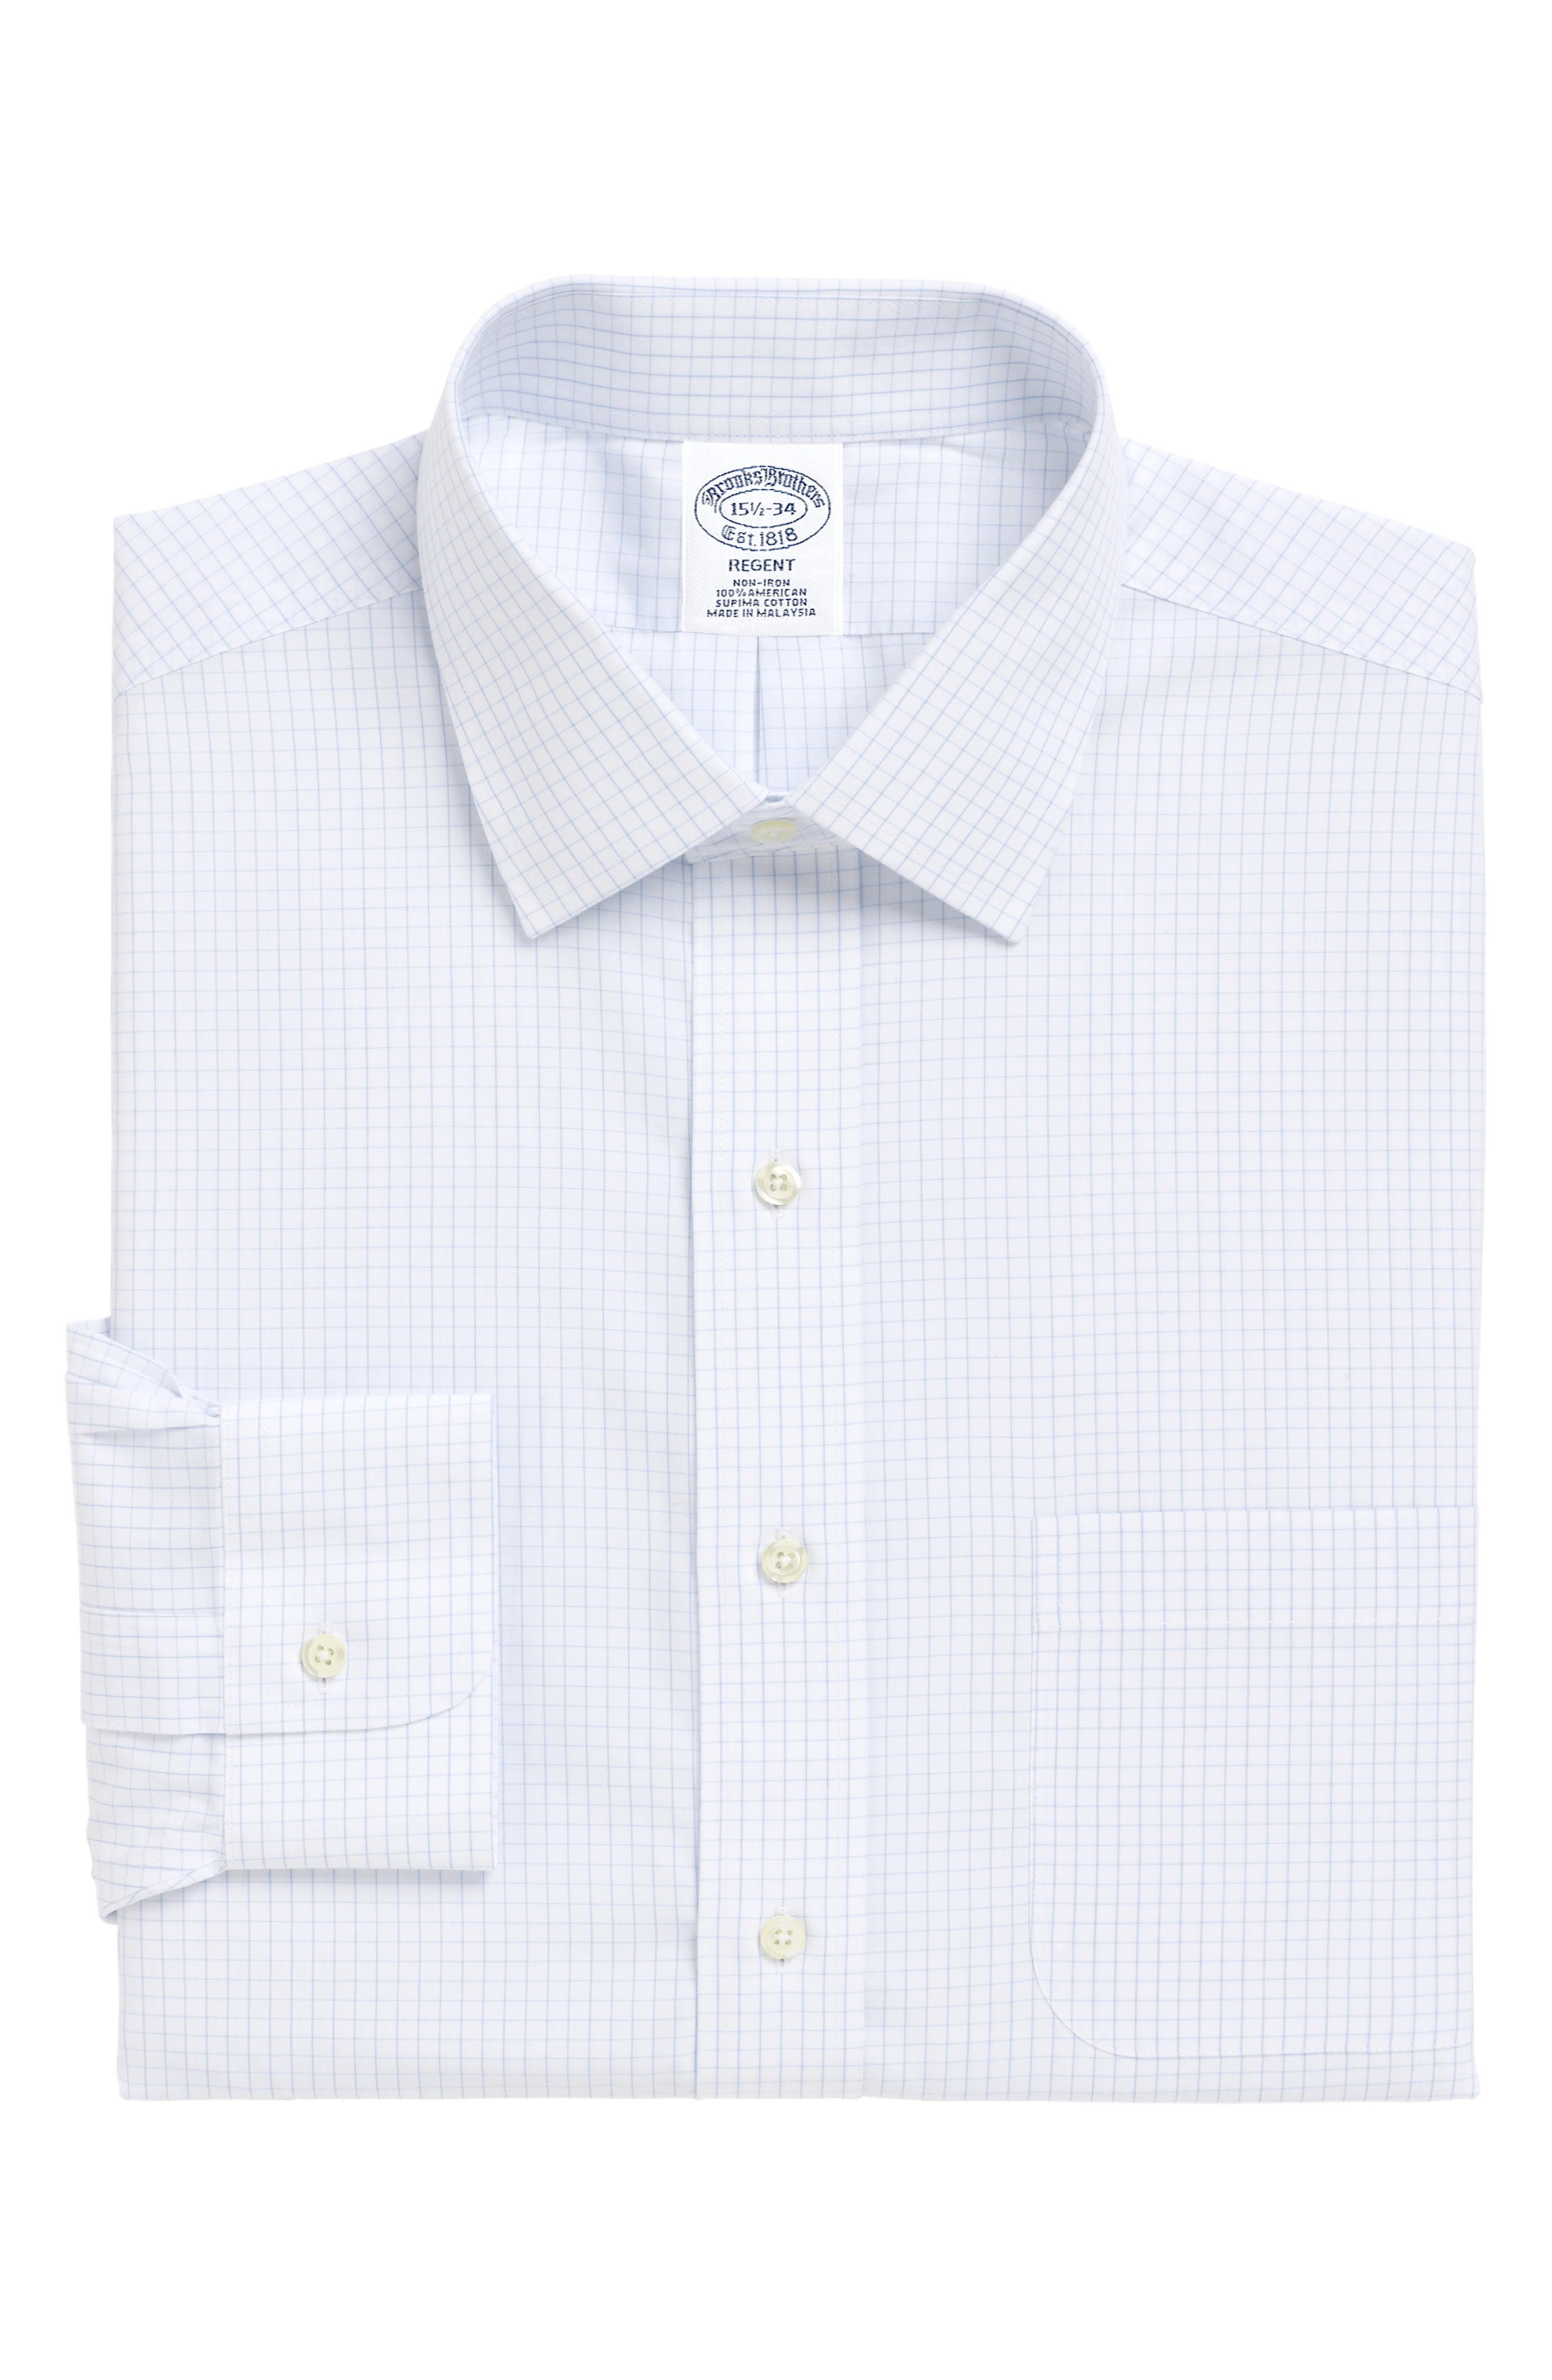 Regular Fit Check Dress Shirt,                             Main thumbnail 1, color,                             LIGHT/ PASTEL BLUE